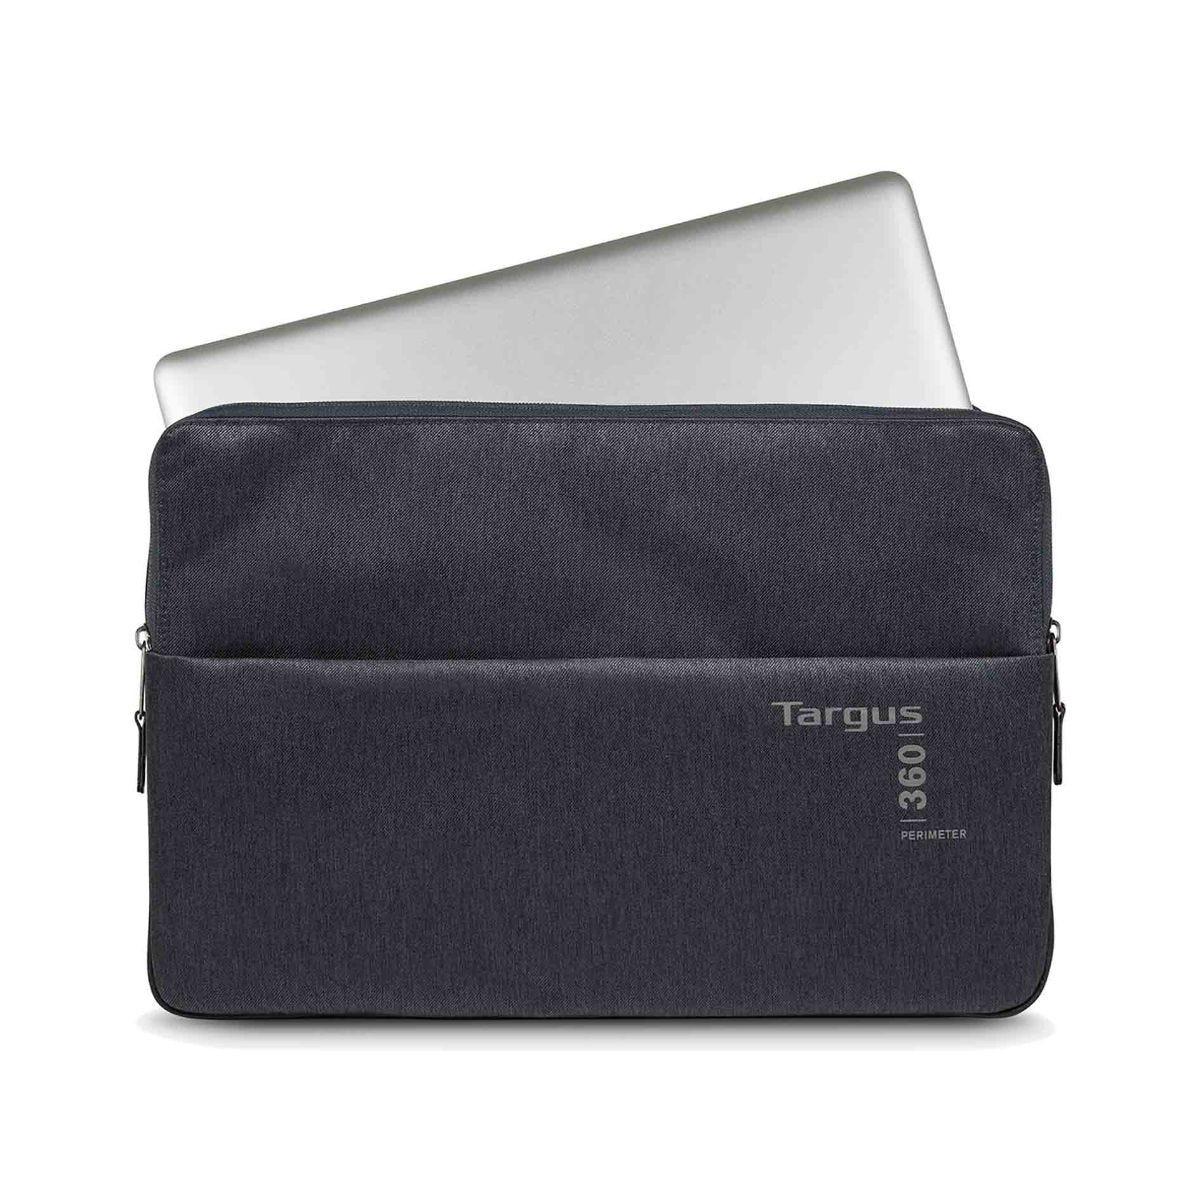 Image of Targus 360 Perimeter Laptop Sleeve 15.6 inch, Ebony